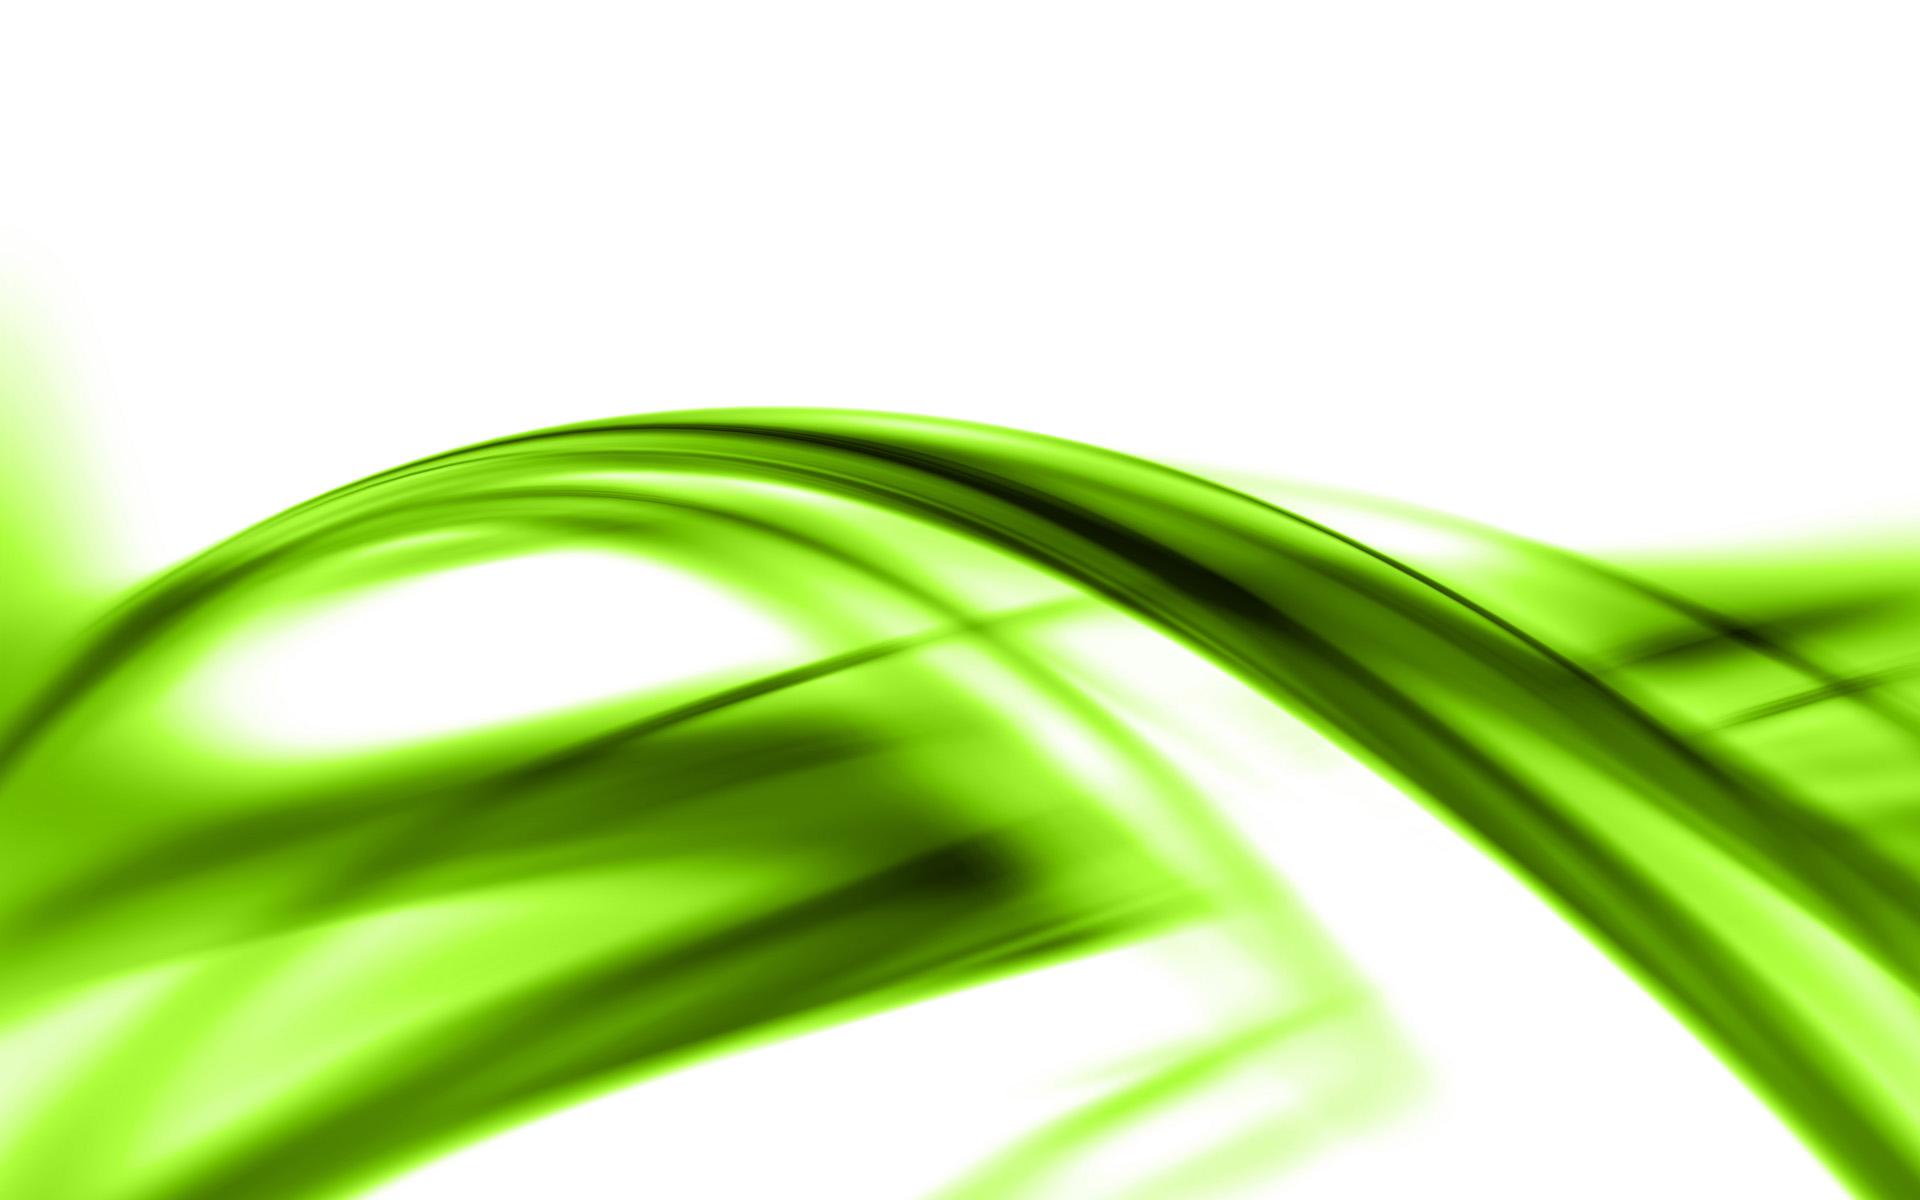 Green Wallpaper Tablet HD 6839 Wallpaper Cool Walldiskpapercom 1920x1200